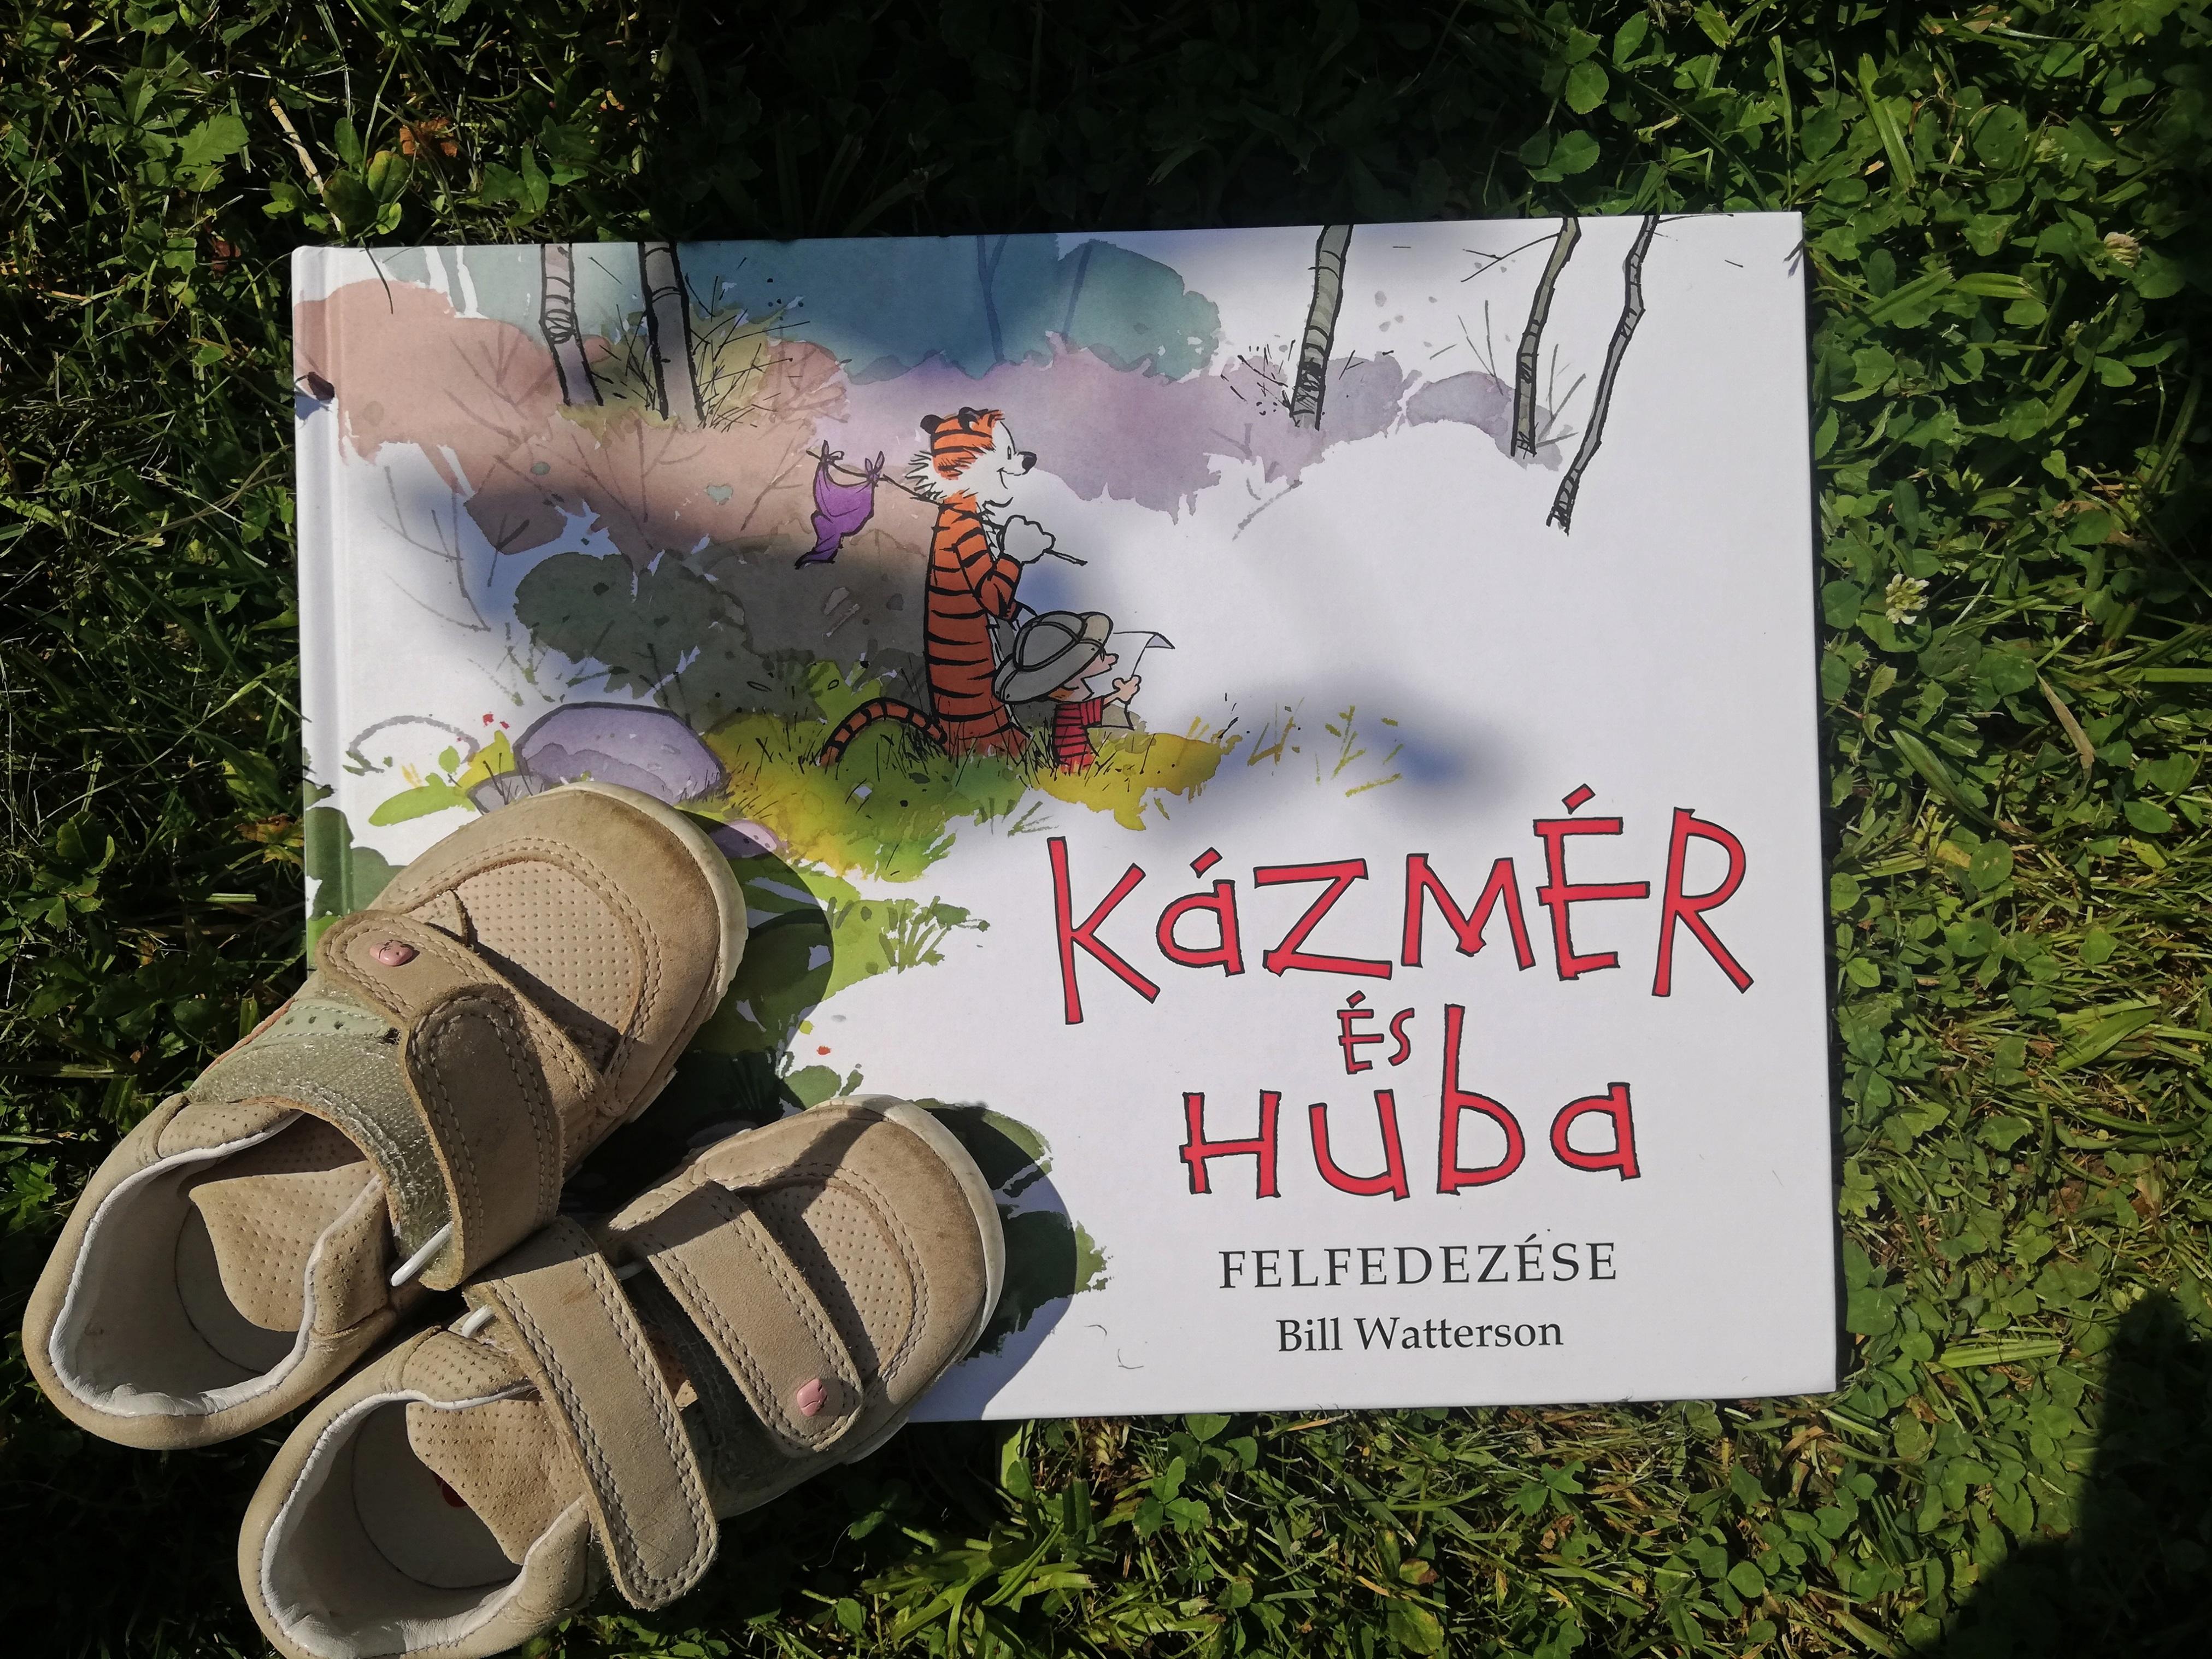 img_kazmer_es_huba_blog.jpg